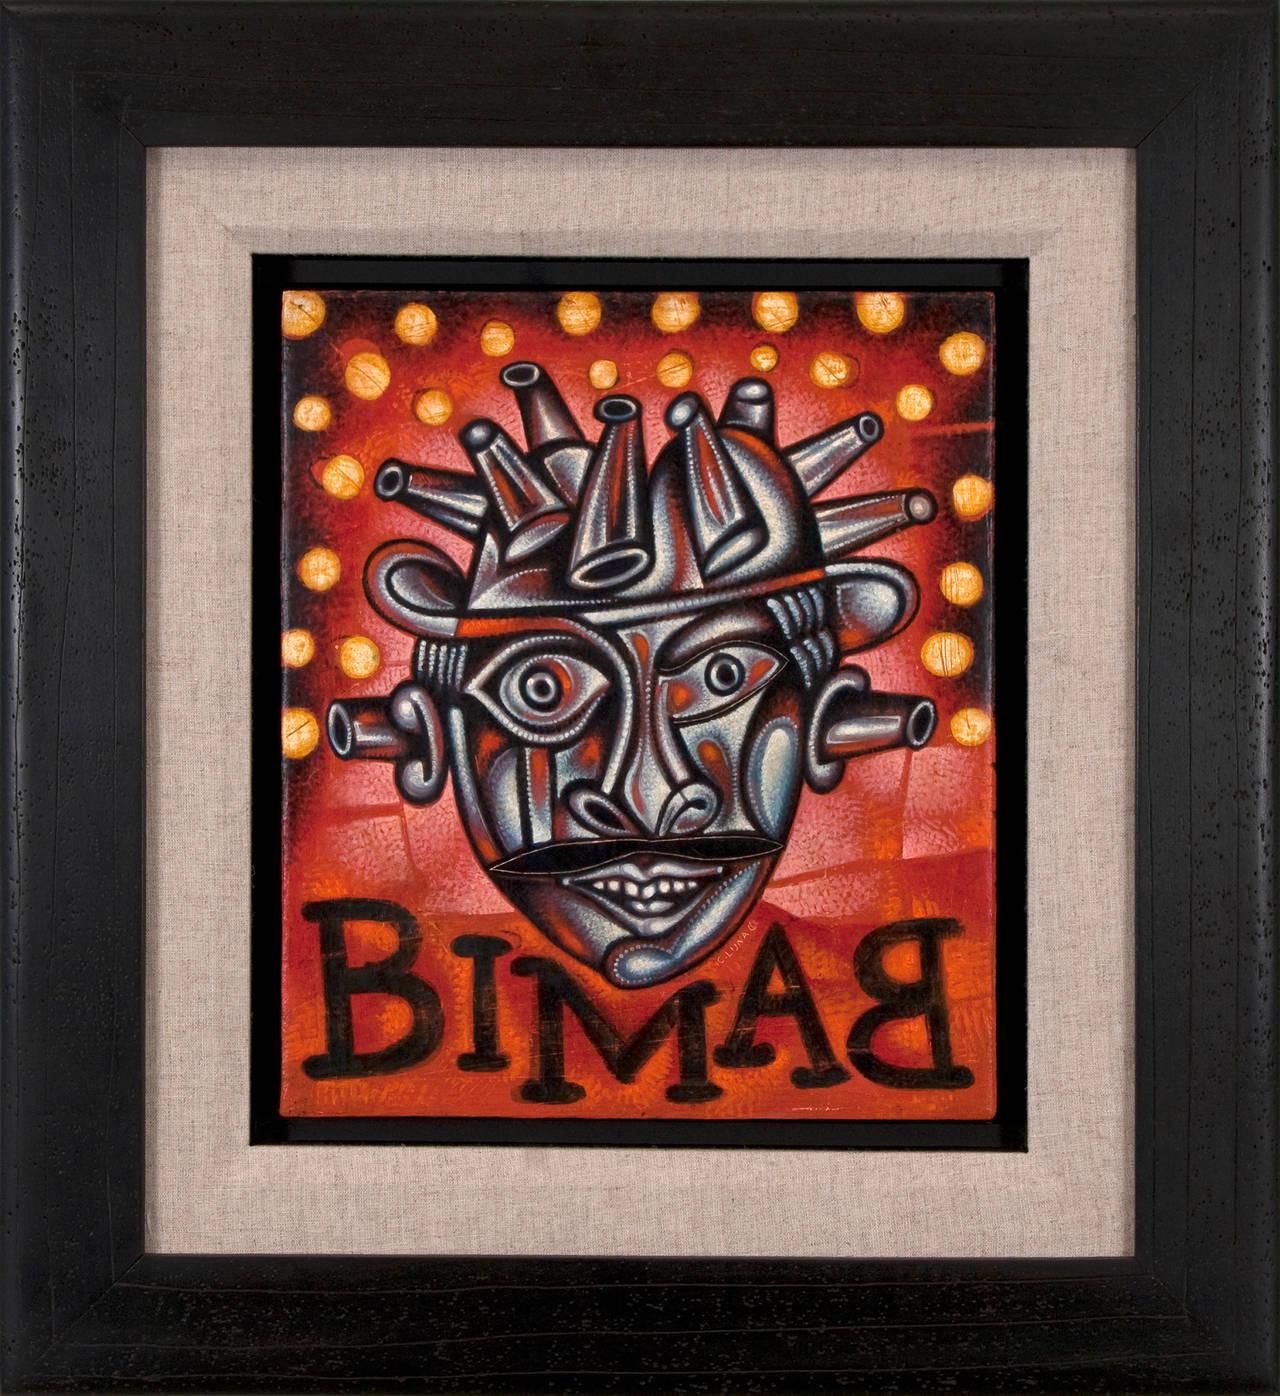 Bimbam - Black Figurative Painting by Carlos Luna